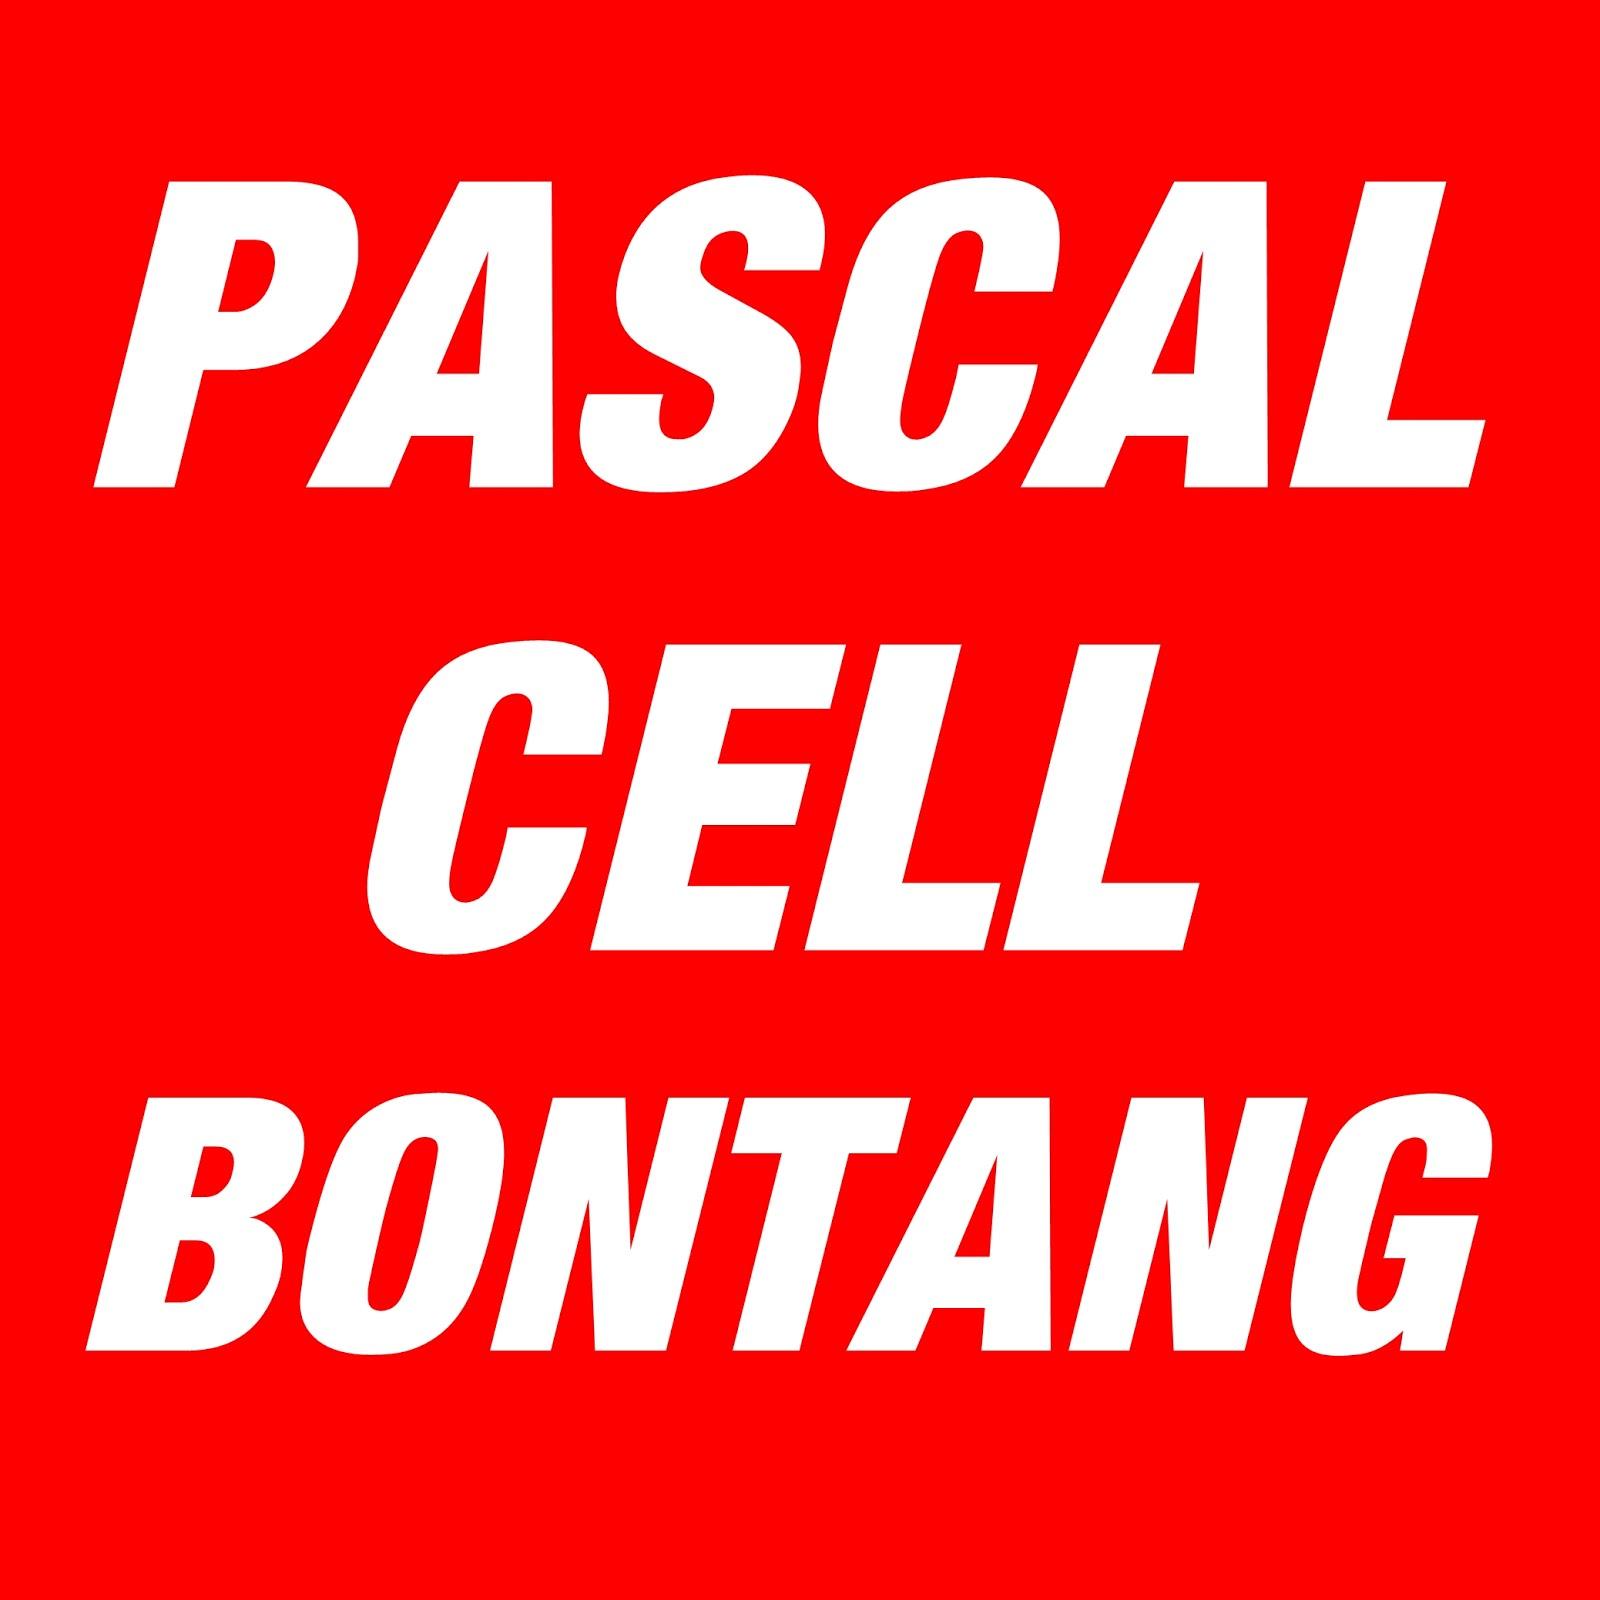 Pascal Cell Bontang